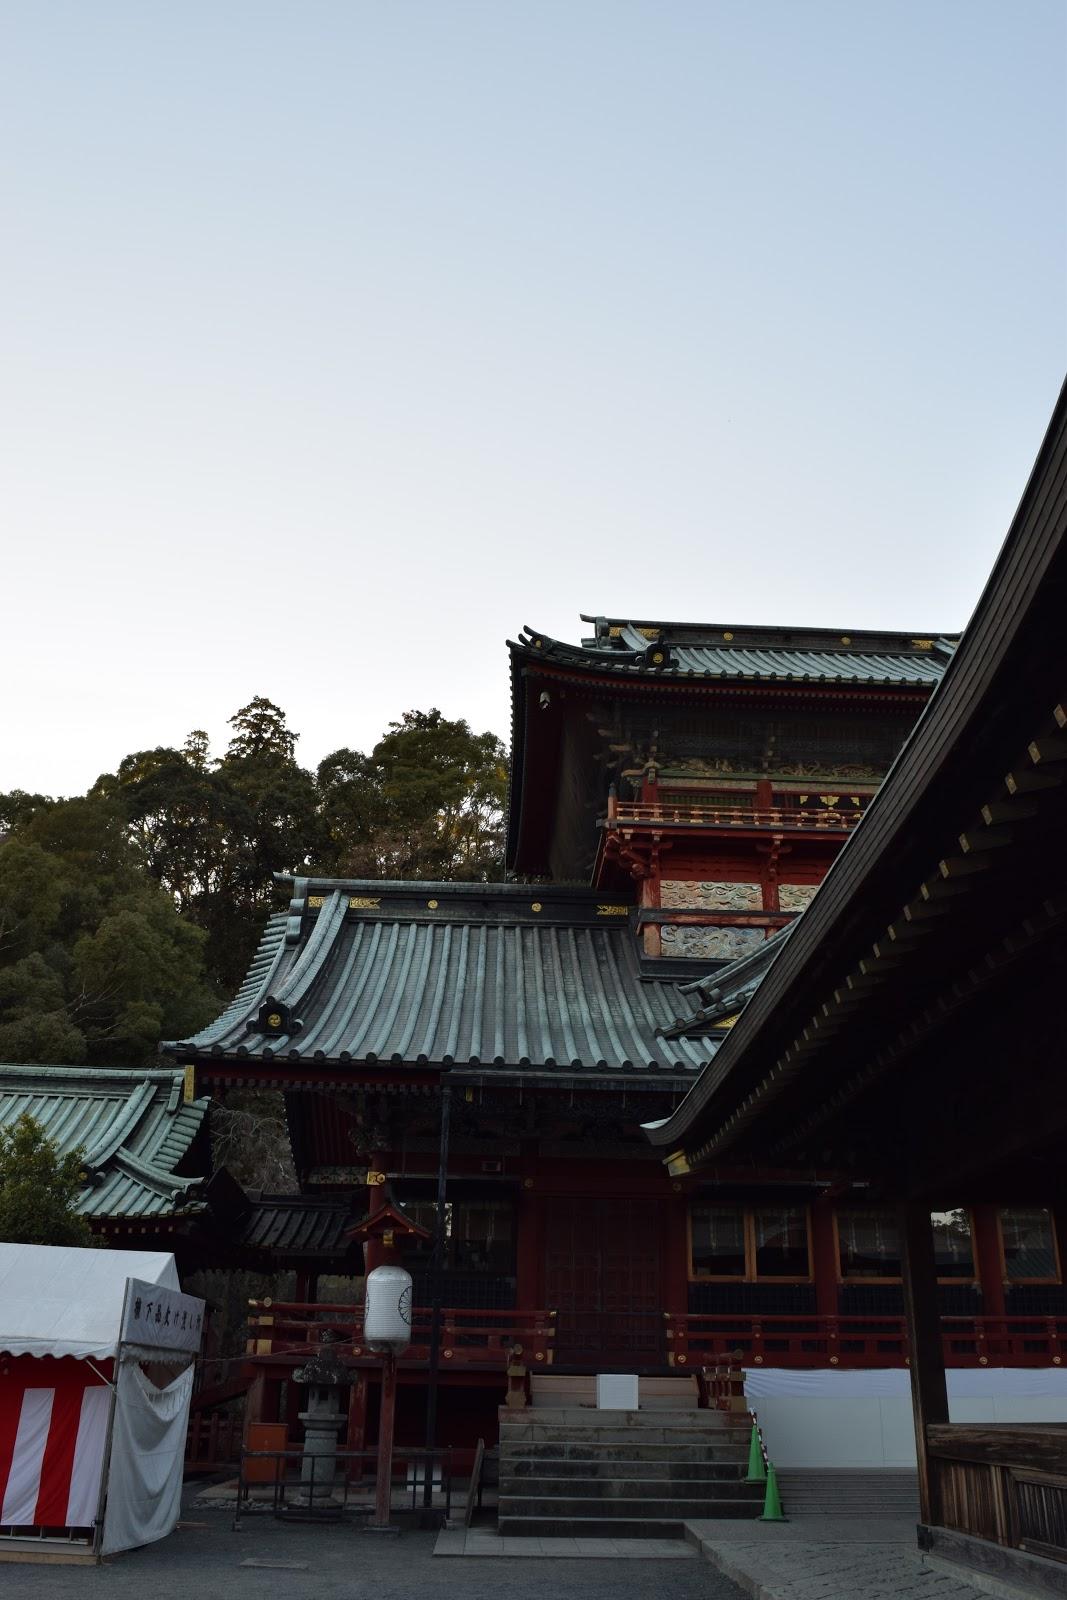 Sengen Jinja, Shizuoka City